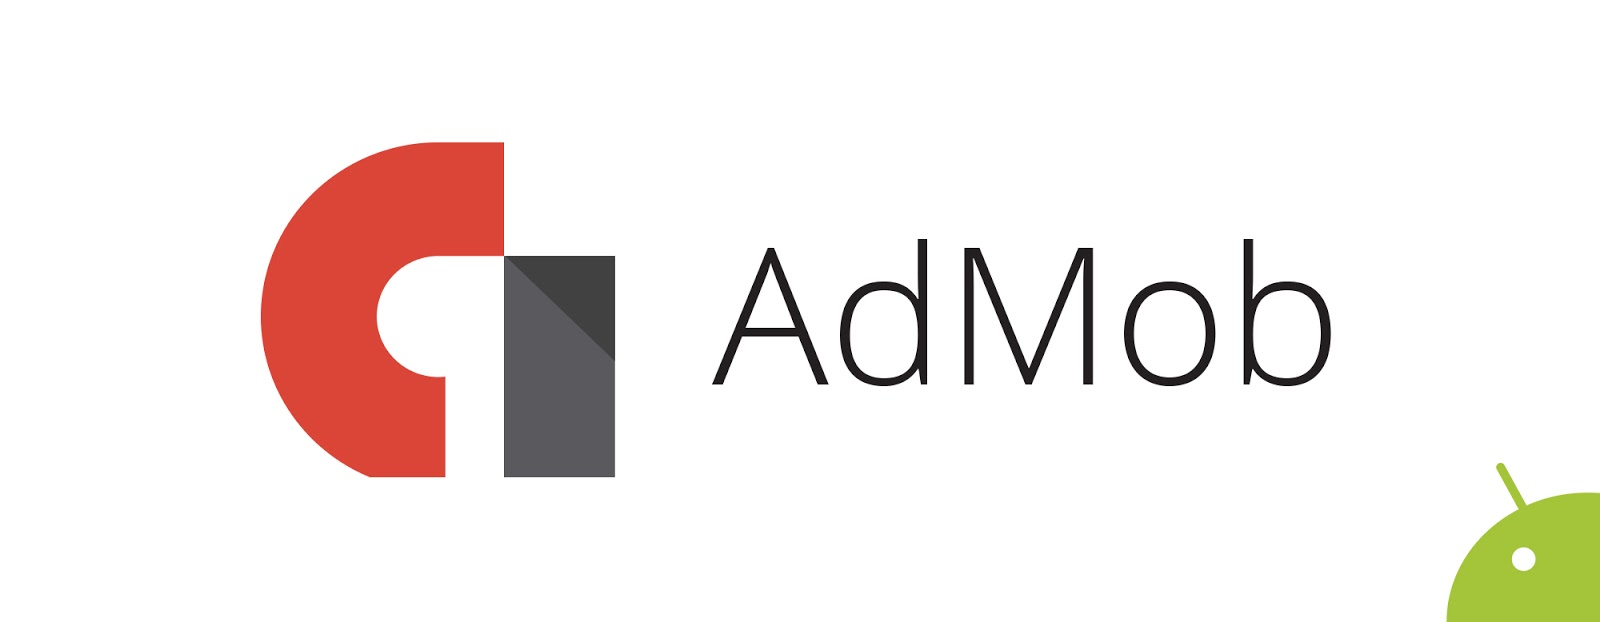 admob อัพเดตใหม่เพิ่มโฆษณารูปแบบวิดิโอสำหรับ banner